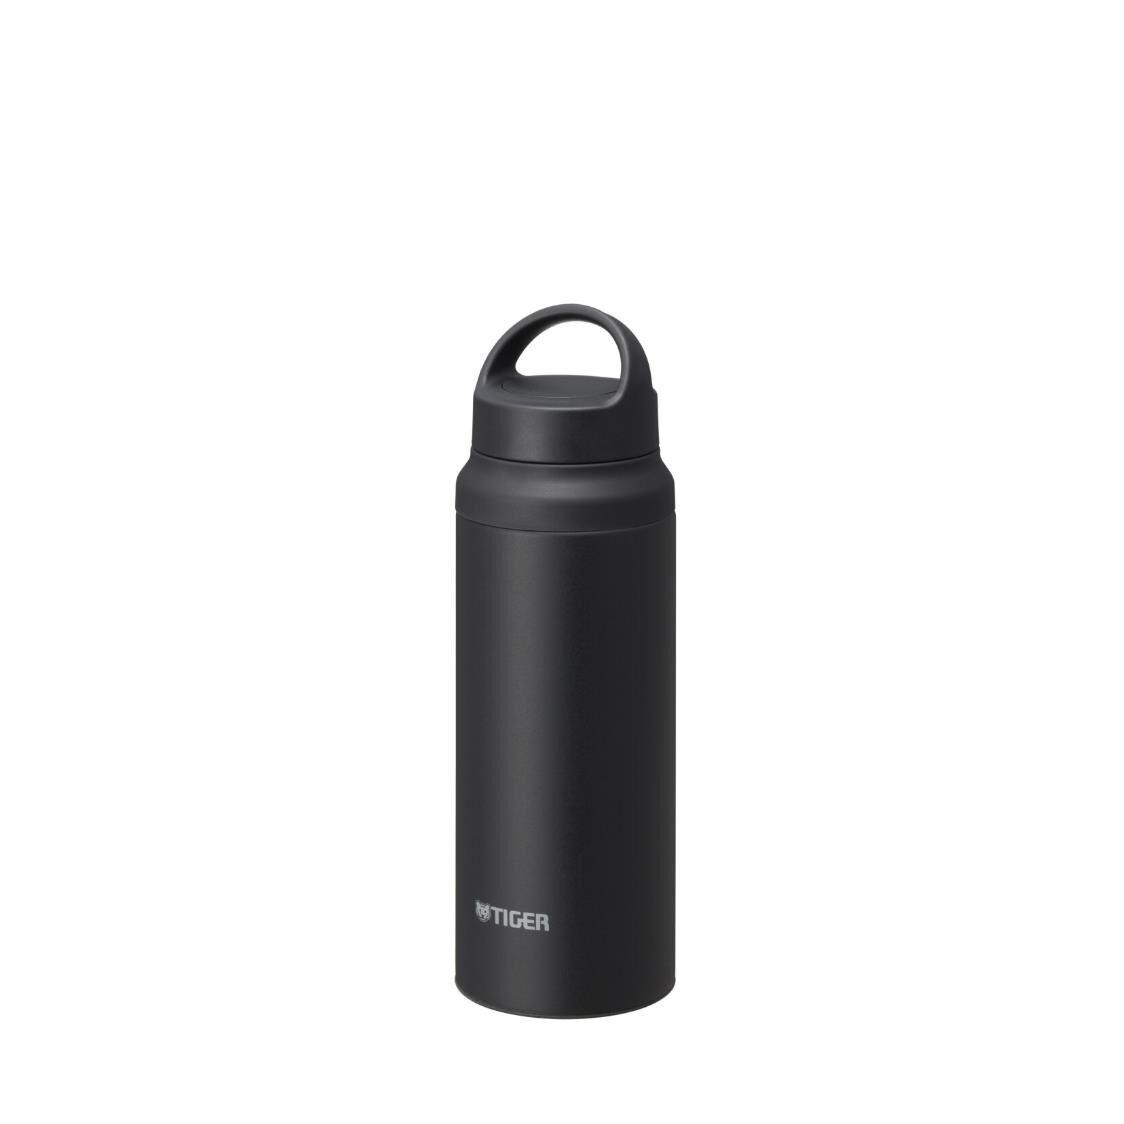 Tiger 600ml Double Stainless Steel Bottle - Stargaze Mcz-S060 Kc